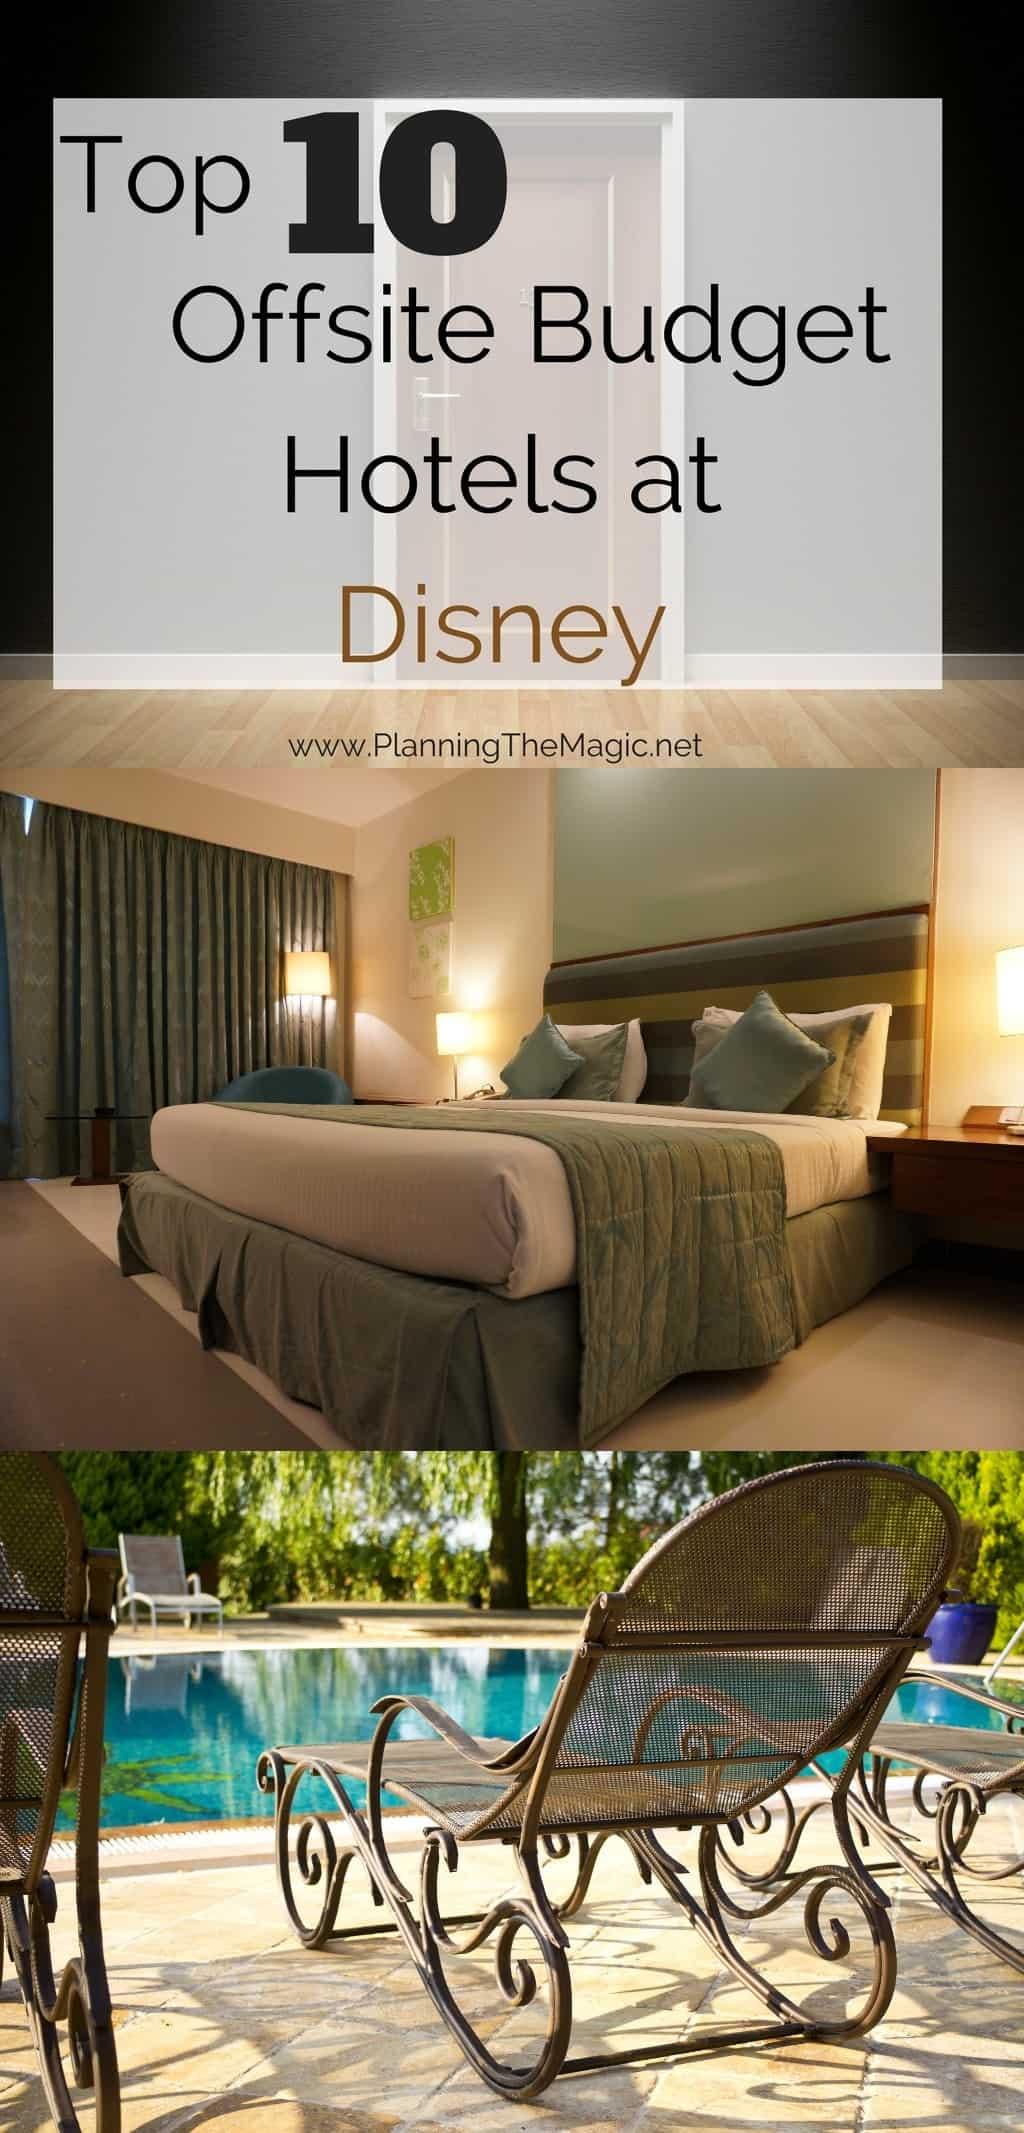 offsite budget hotel Disney